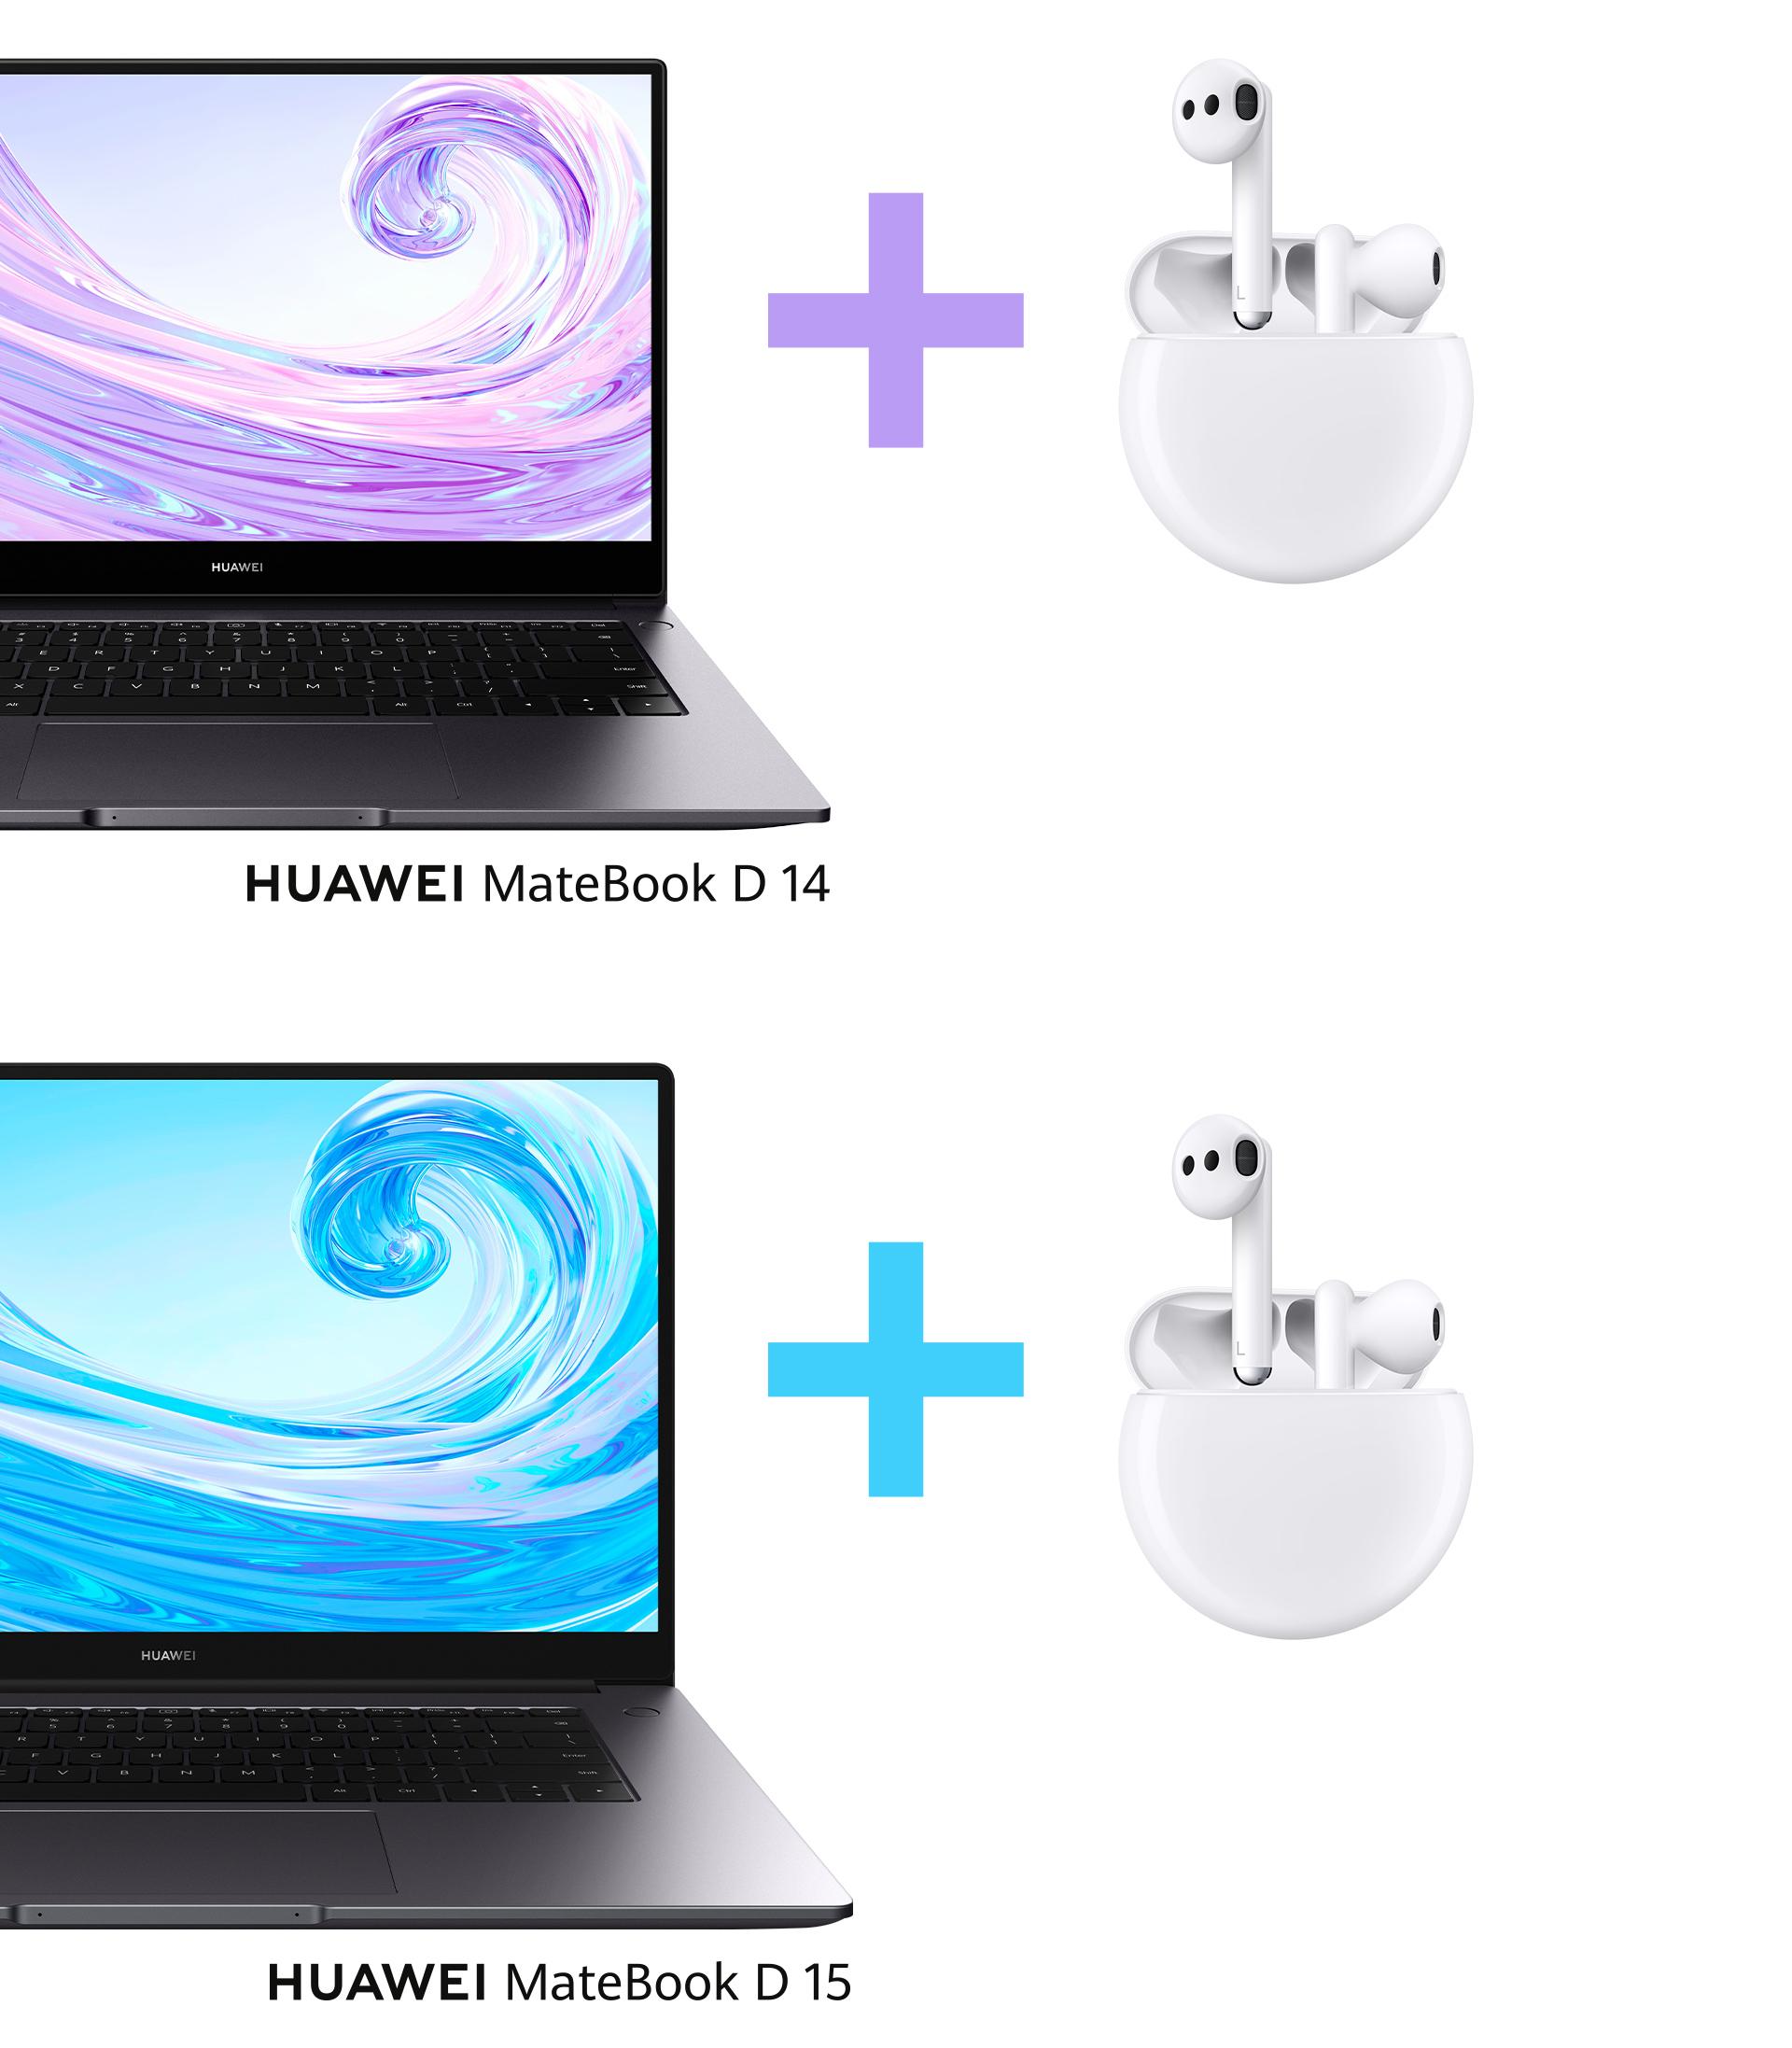 HUAWEI MateBook D 14 und HUAWEI MateBook D 15 mit HUAWEI FreeBuds 3